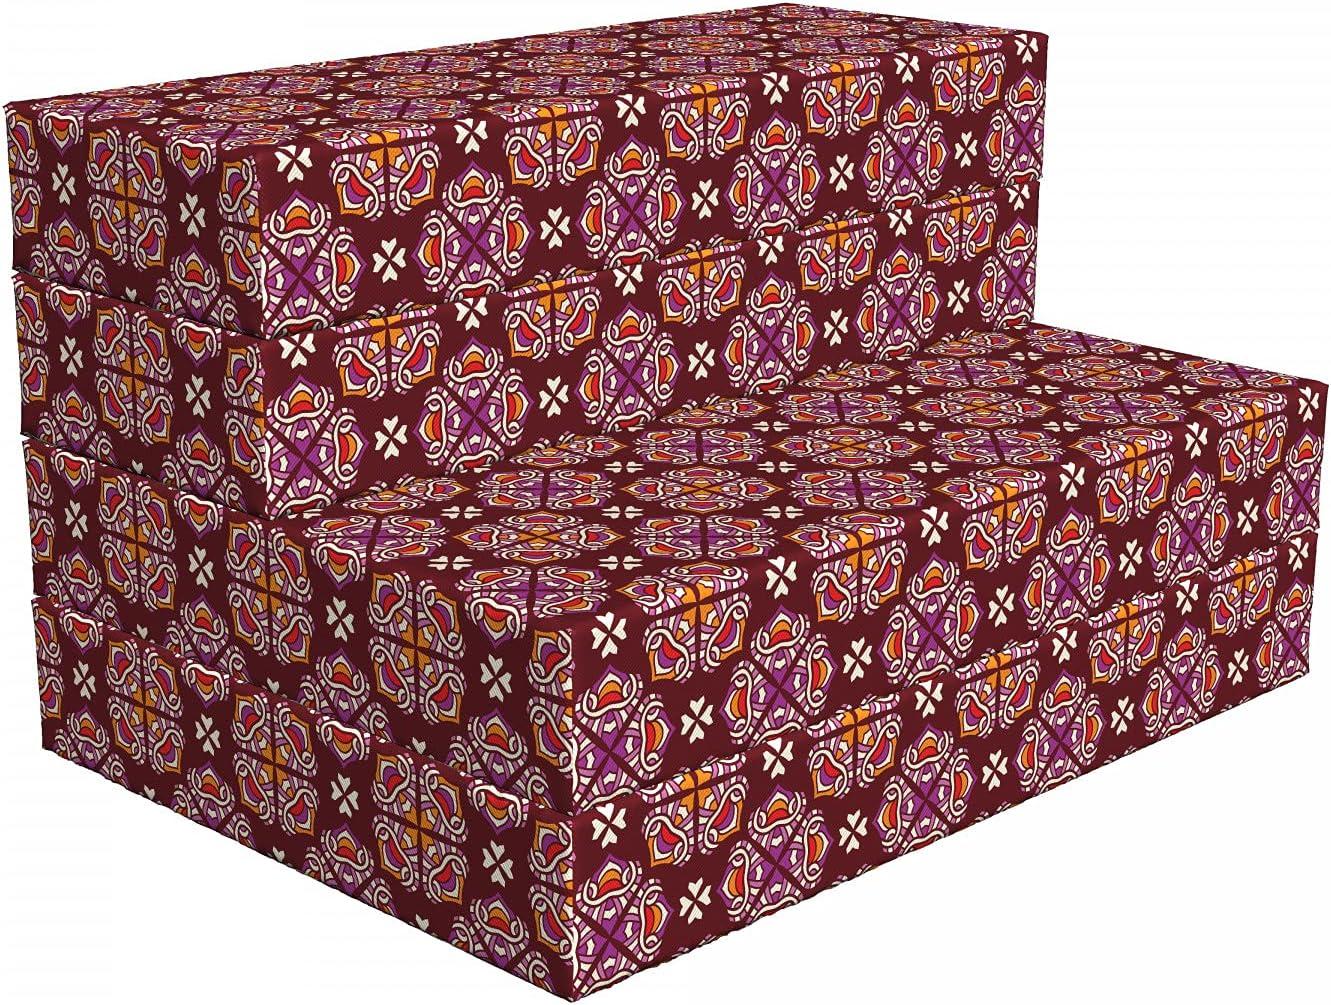 Ambesonne Tribal Foldable Mattress Swirls 74 Ornamental New arrival Max 58% OFF Floral